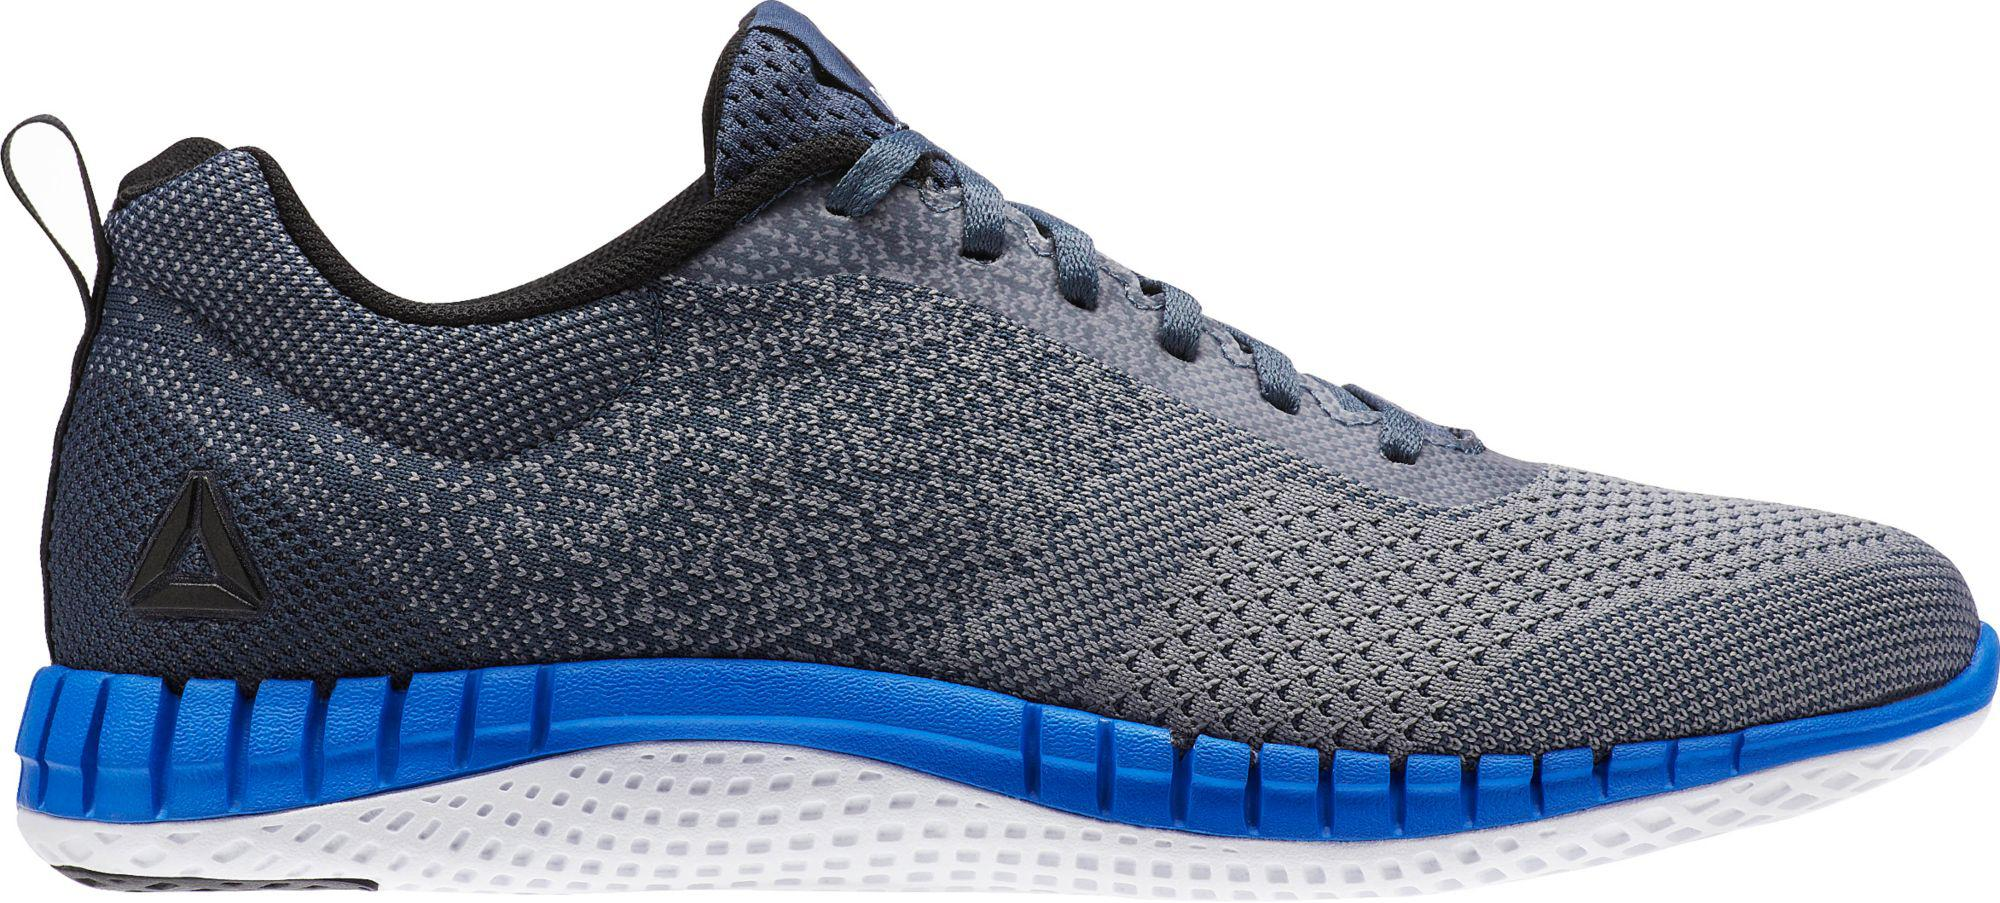 b4b82289e4e313 Lyst - Reebok Print Run Prime Ultraknit Running Shoes in Blue for Men